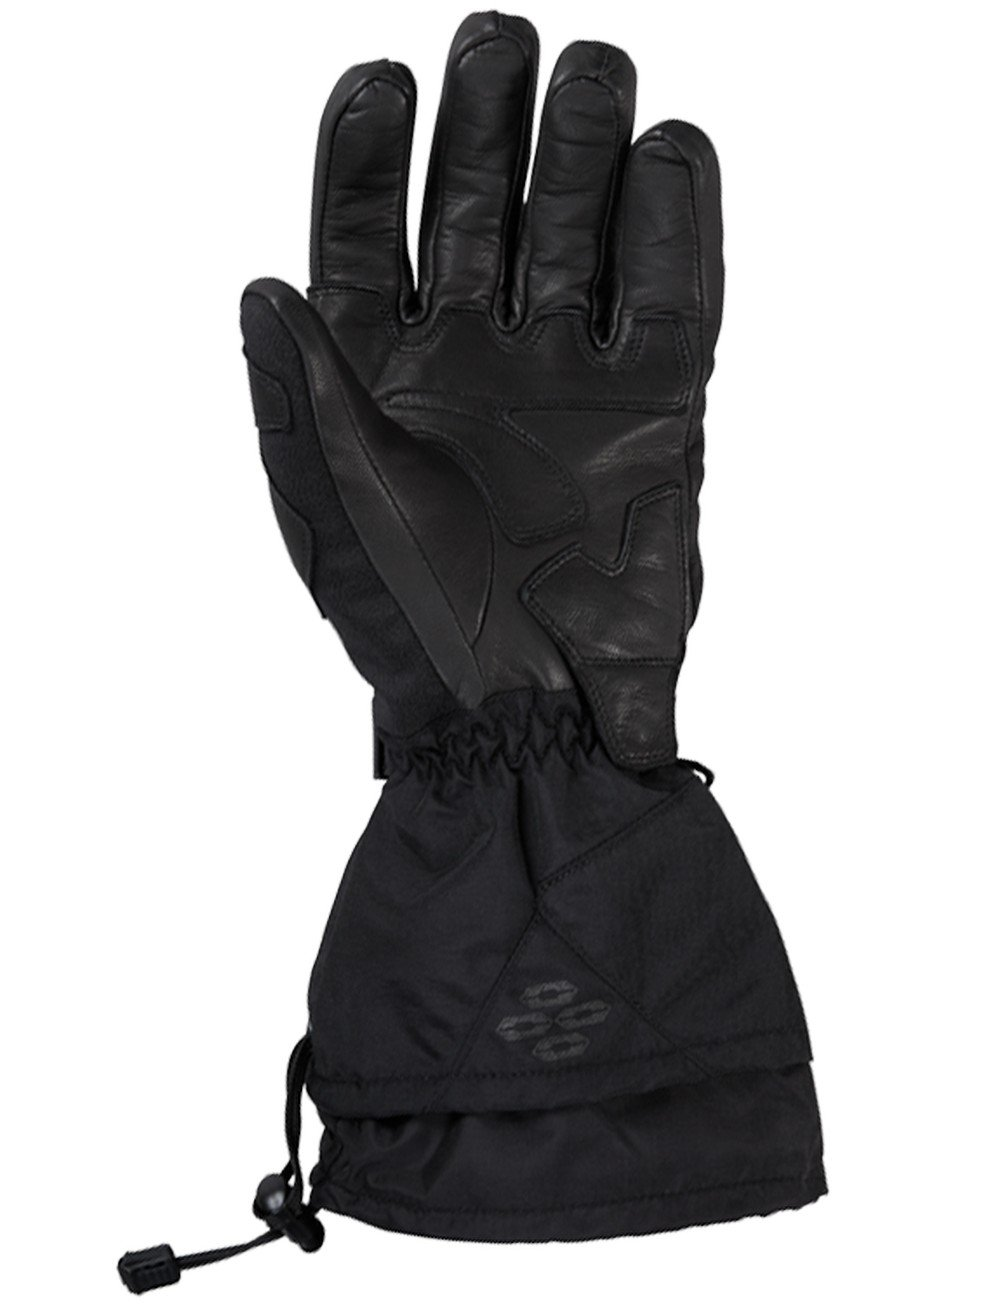 Black LRG Castle X Rival-G1 Snowmobile Glove